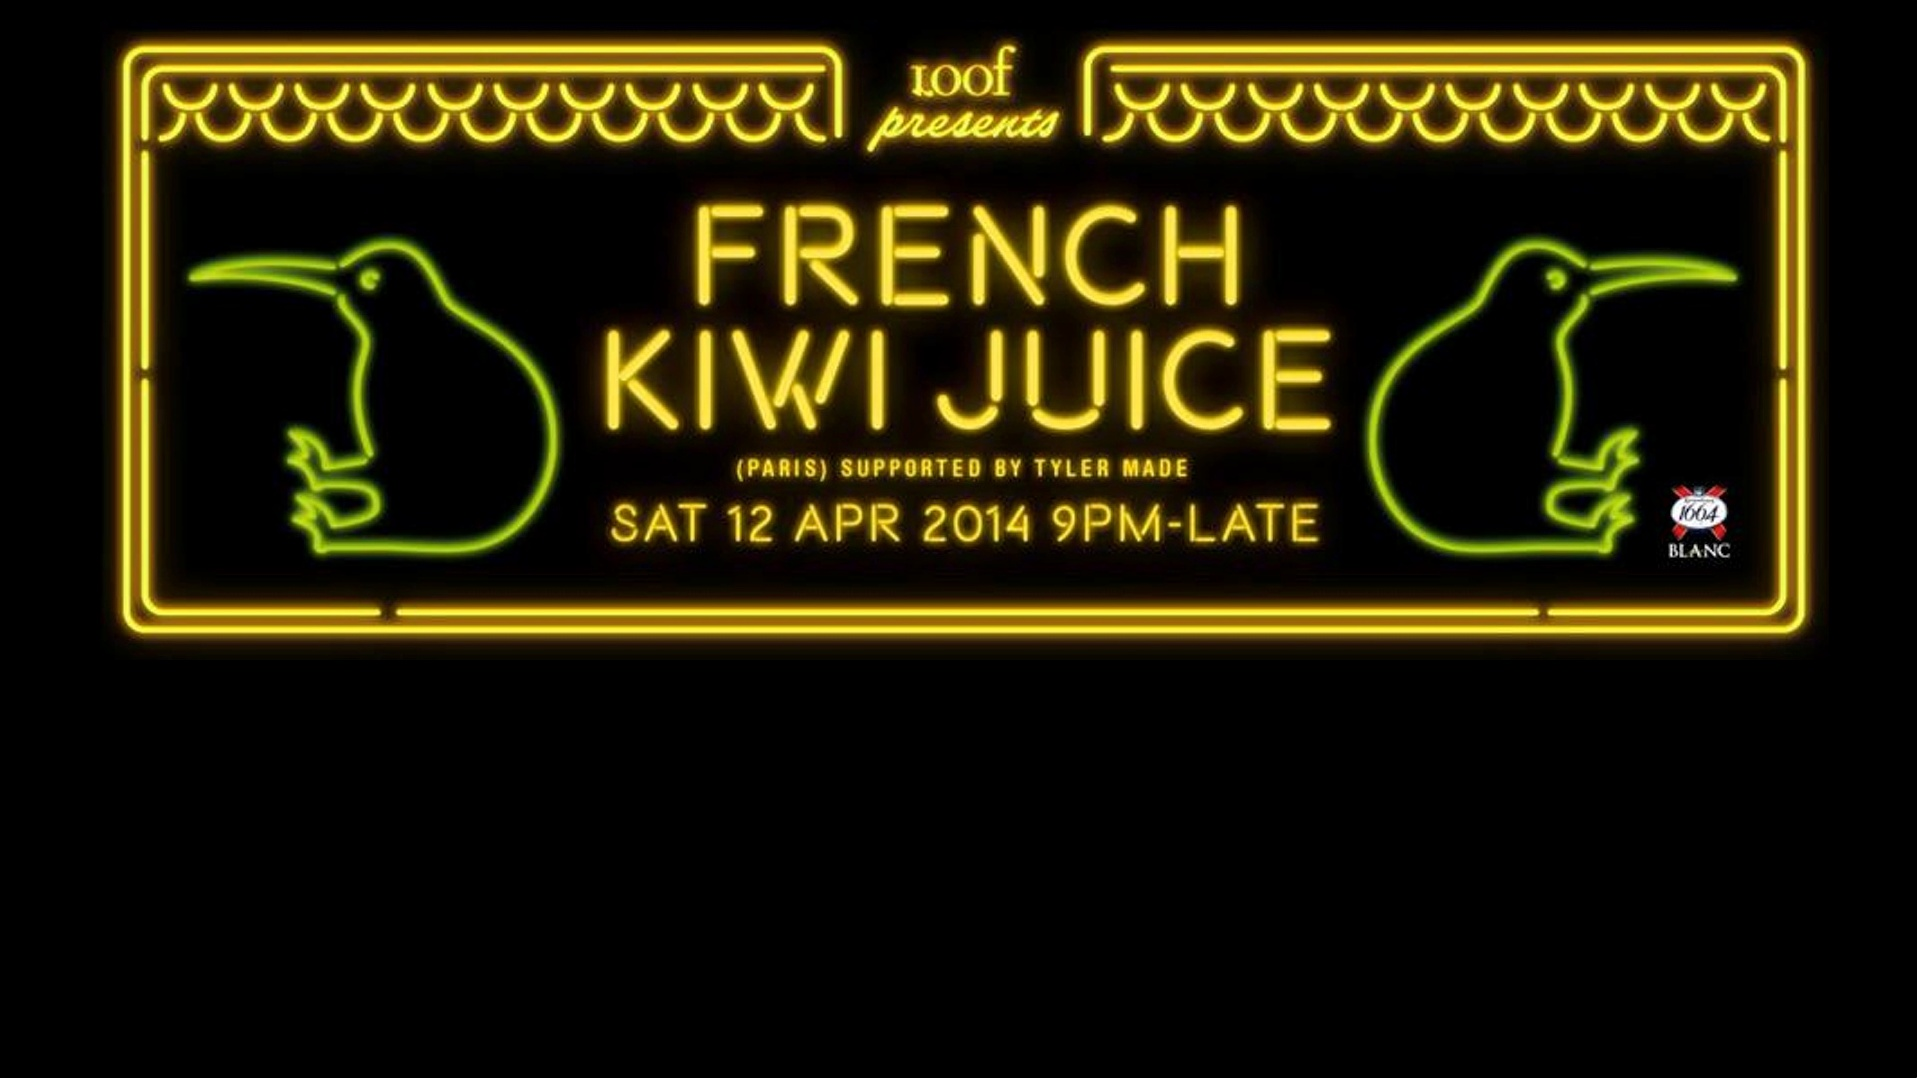 Loof presents: French Kiwi Juice